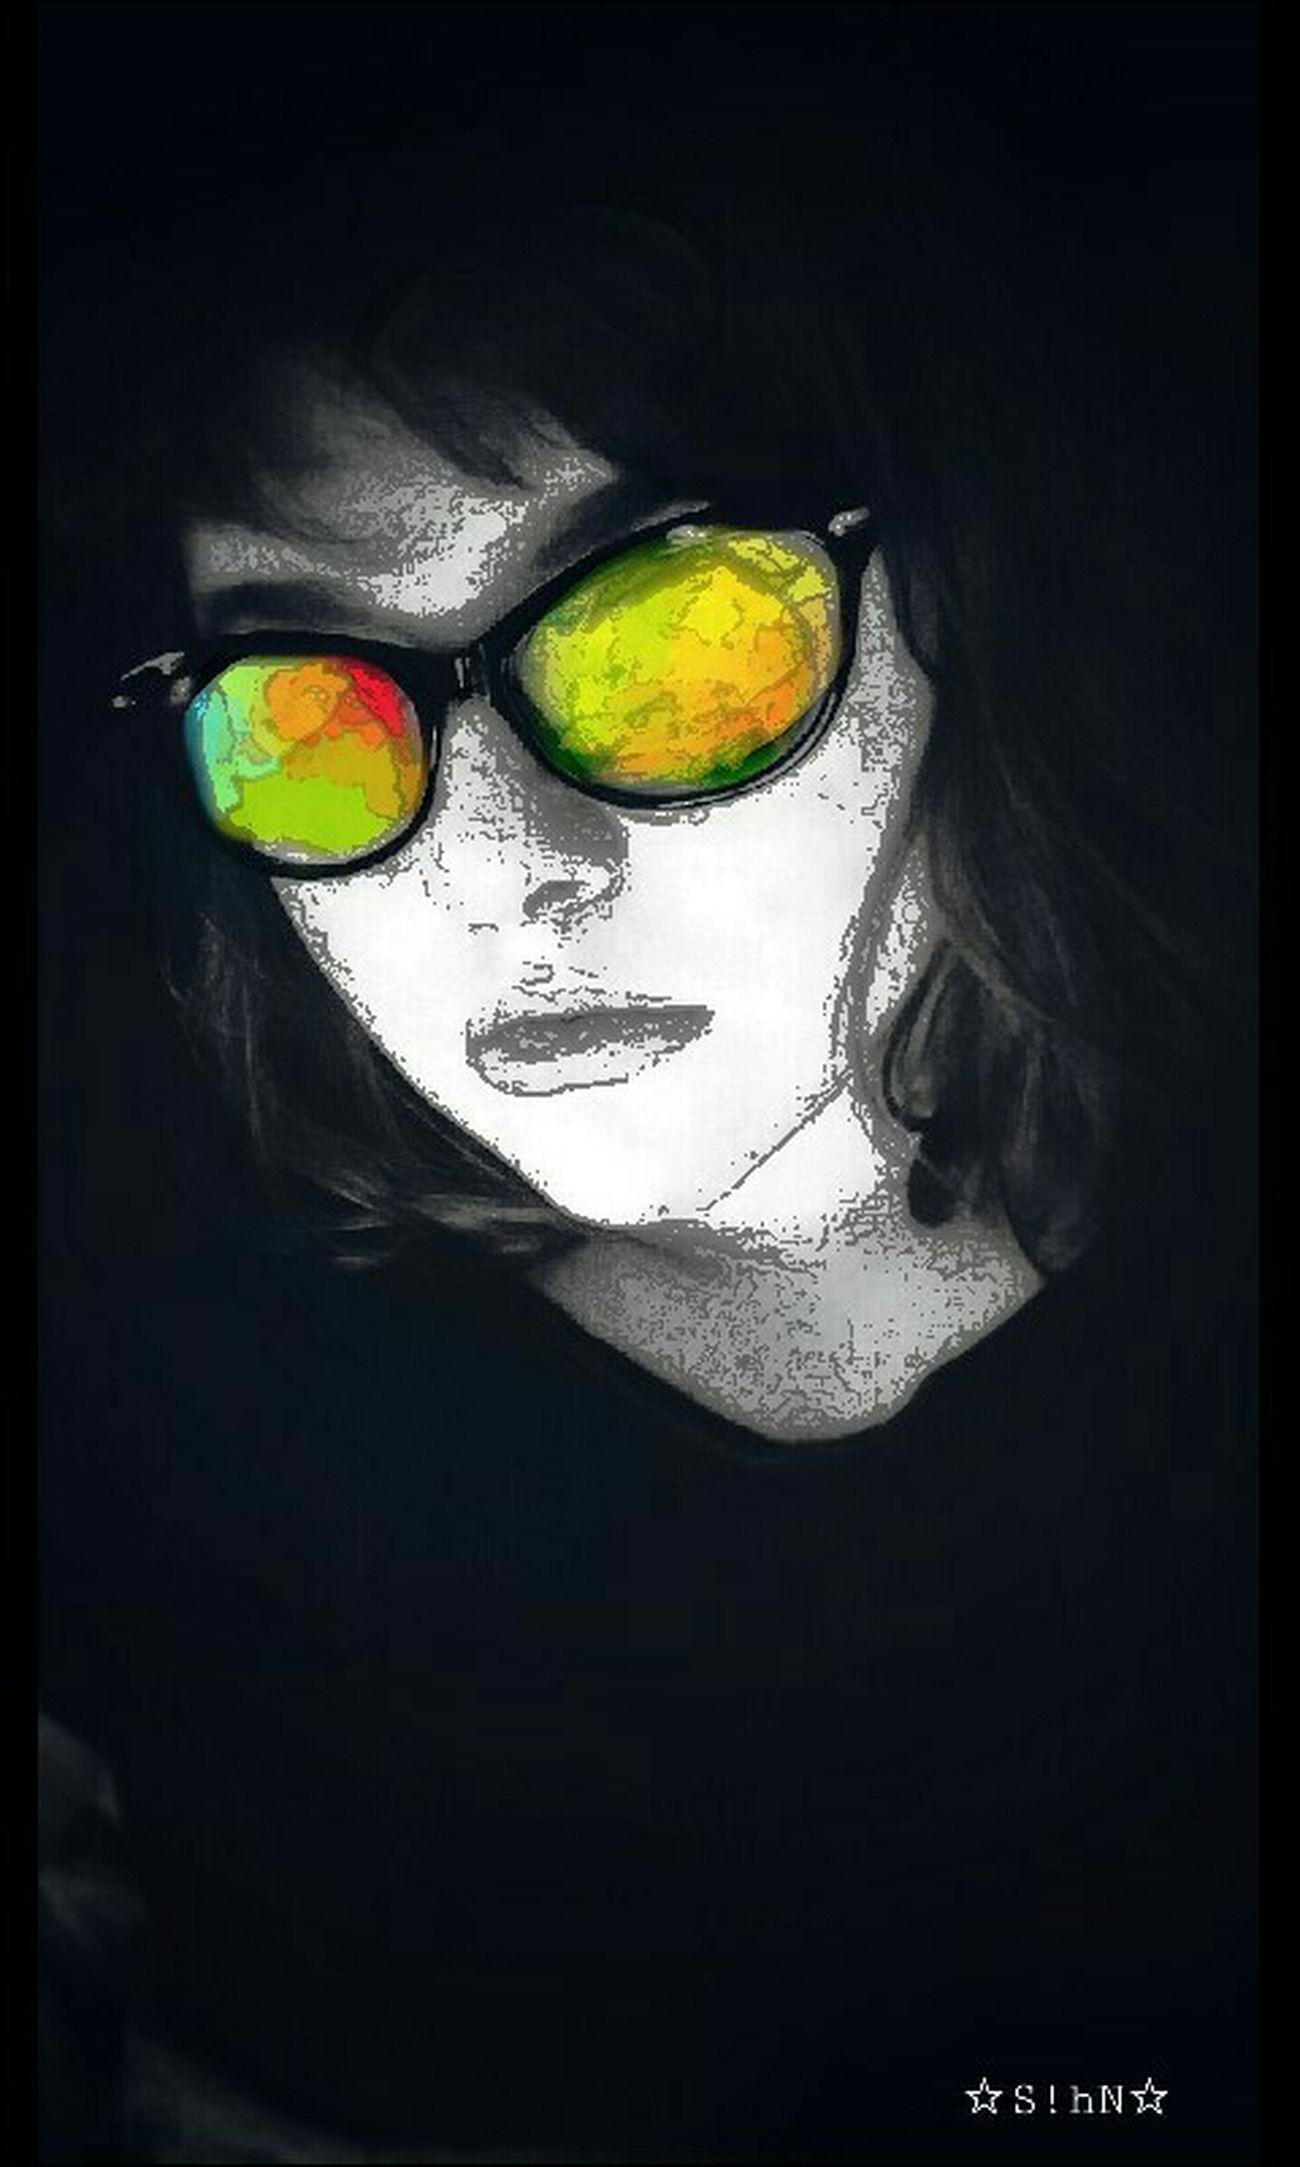 Self Portrait Masks Artistic Expression EyeEm Best Edits Black & White MYArtwork❤ Artistic Photo Freetoedit Self Portrait Around The World Art, Drawing, Creativity Drawstepbystep